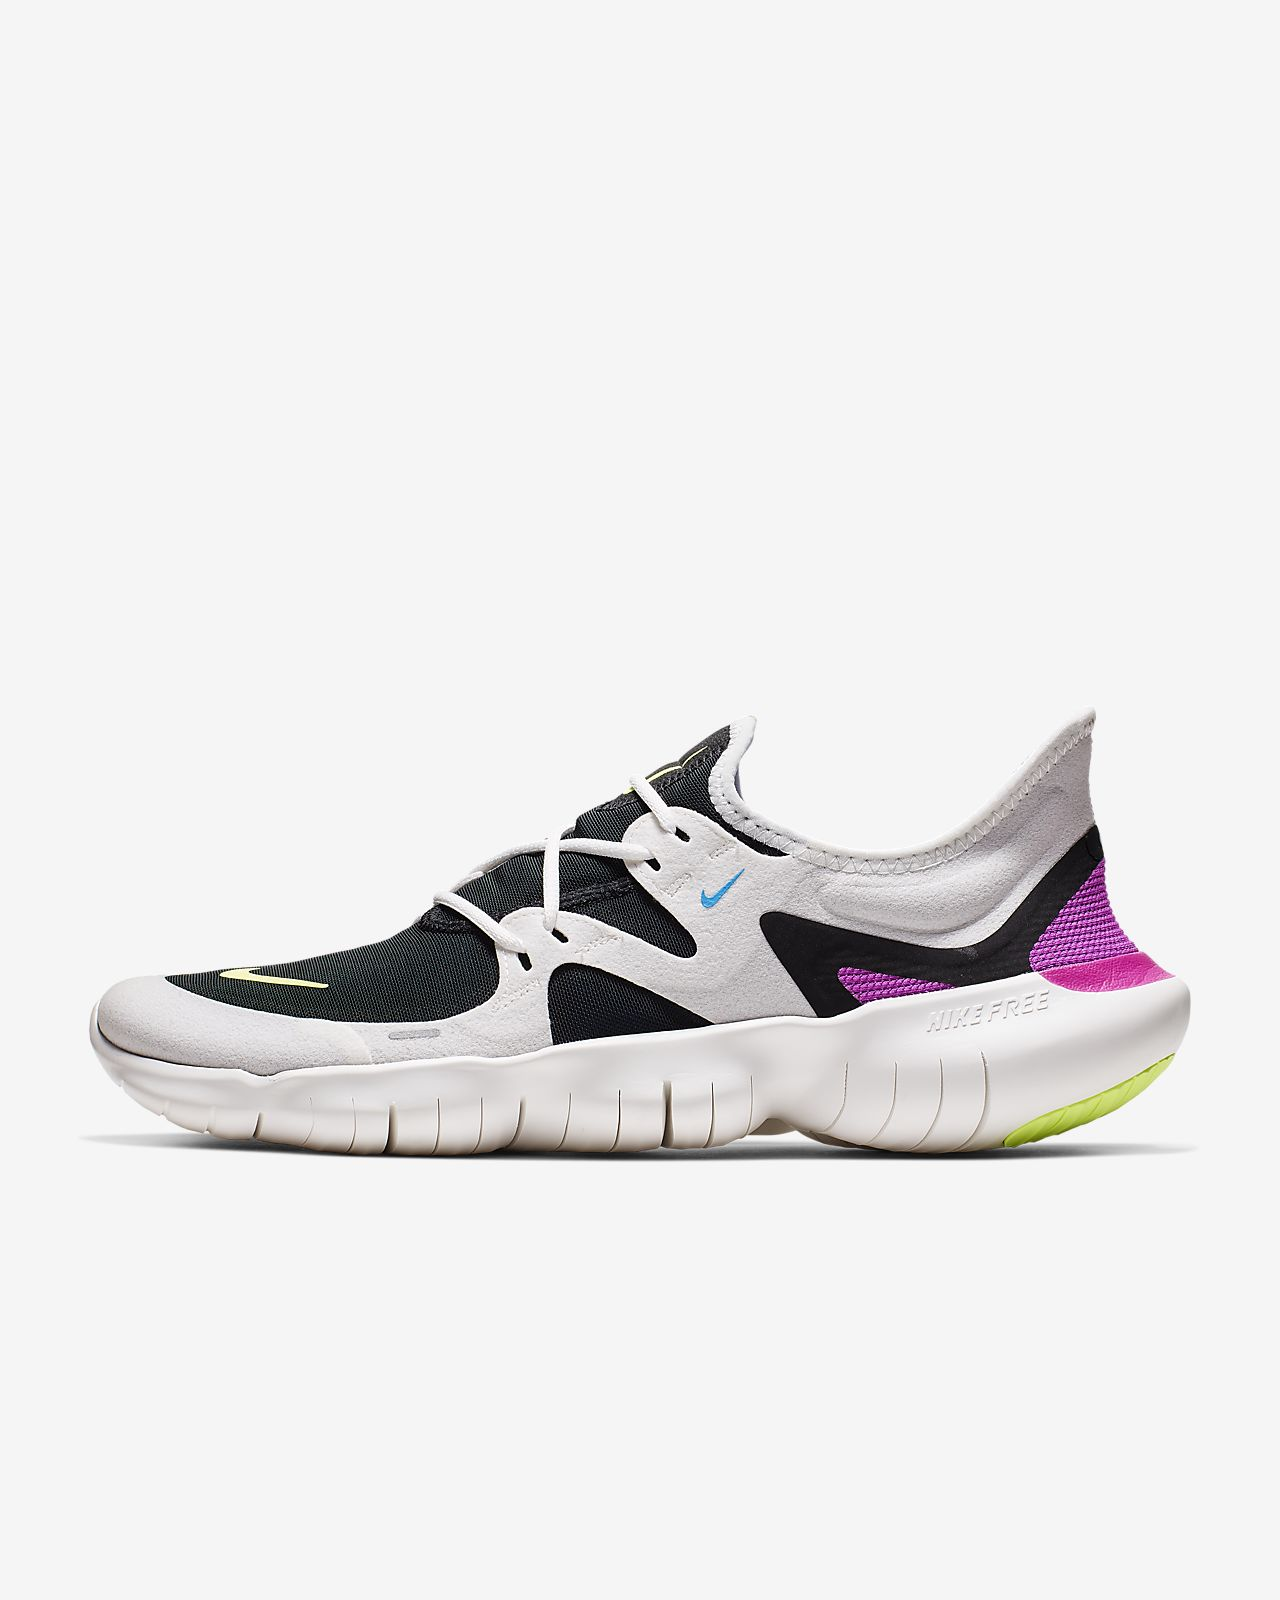 sneakers for cheap b505a a1eef ... Löparsko Nike Free RN 5.0 för män